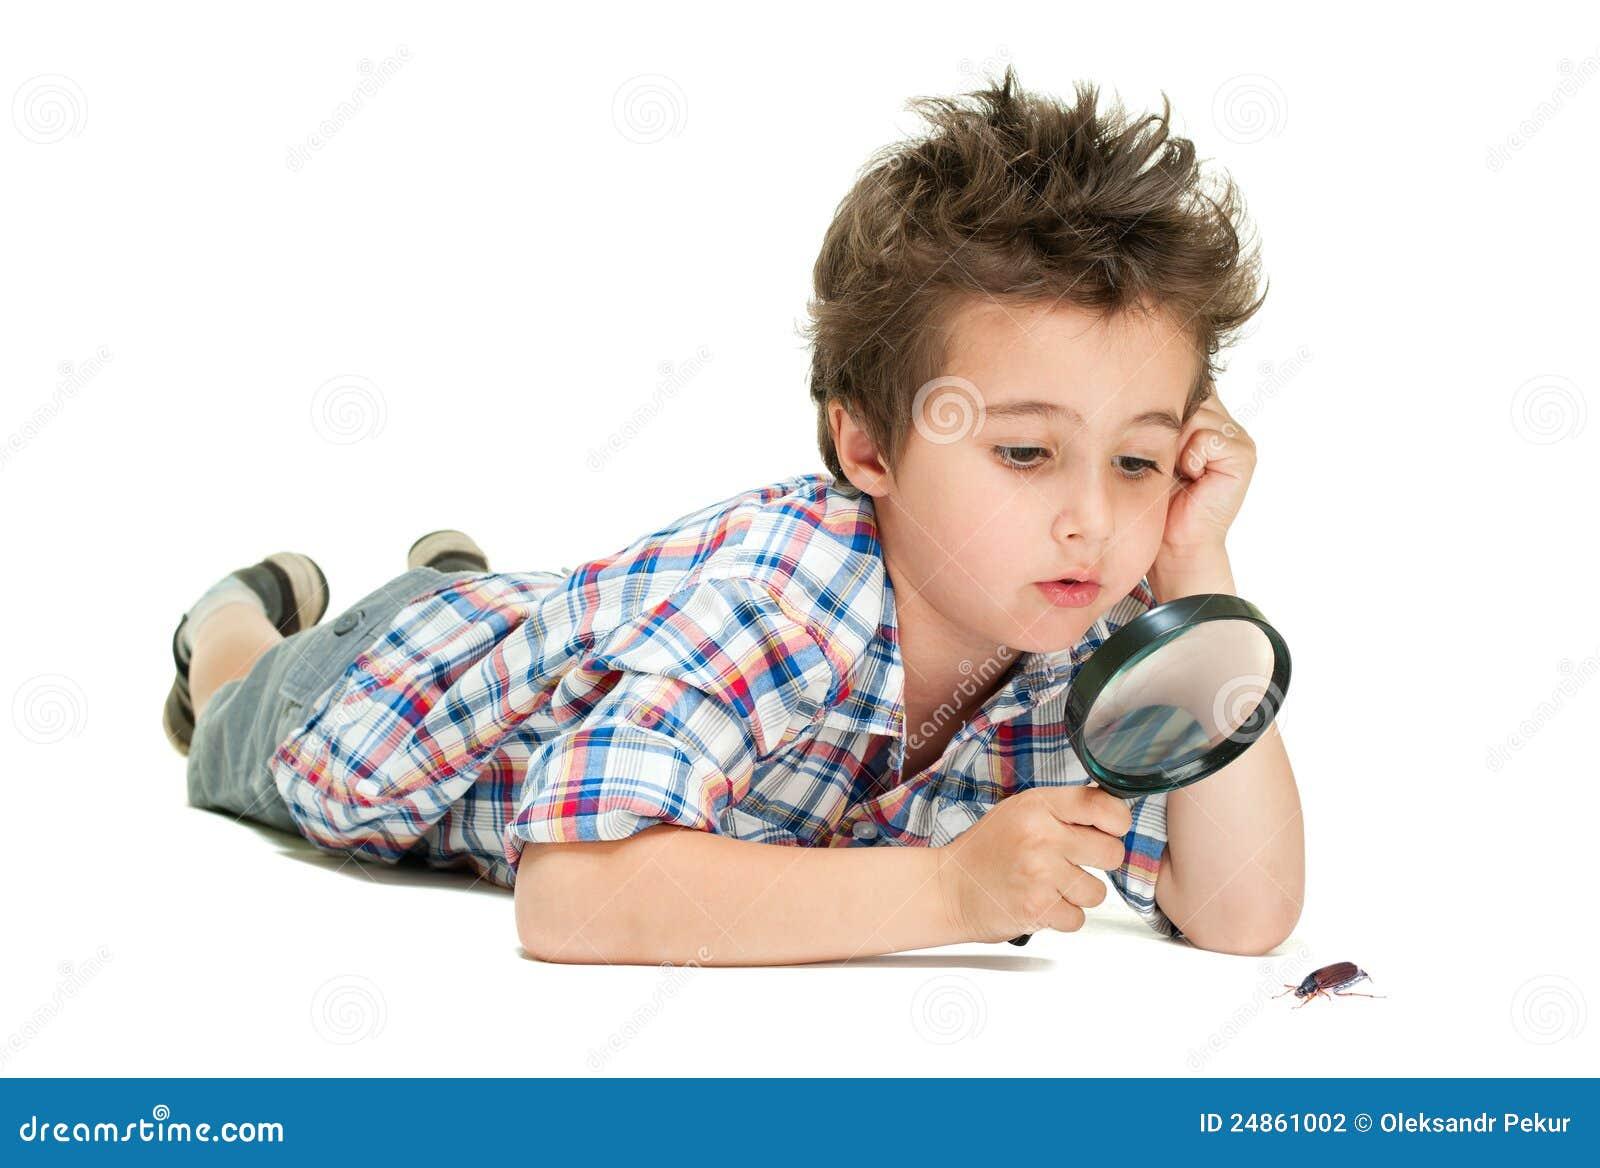 attentive little boy with weird stock photography image clip art little boy images clip art little boy jesus